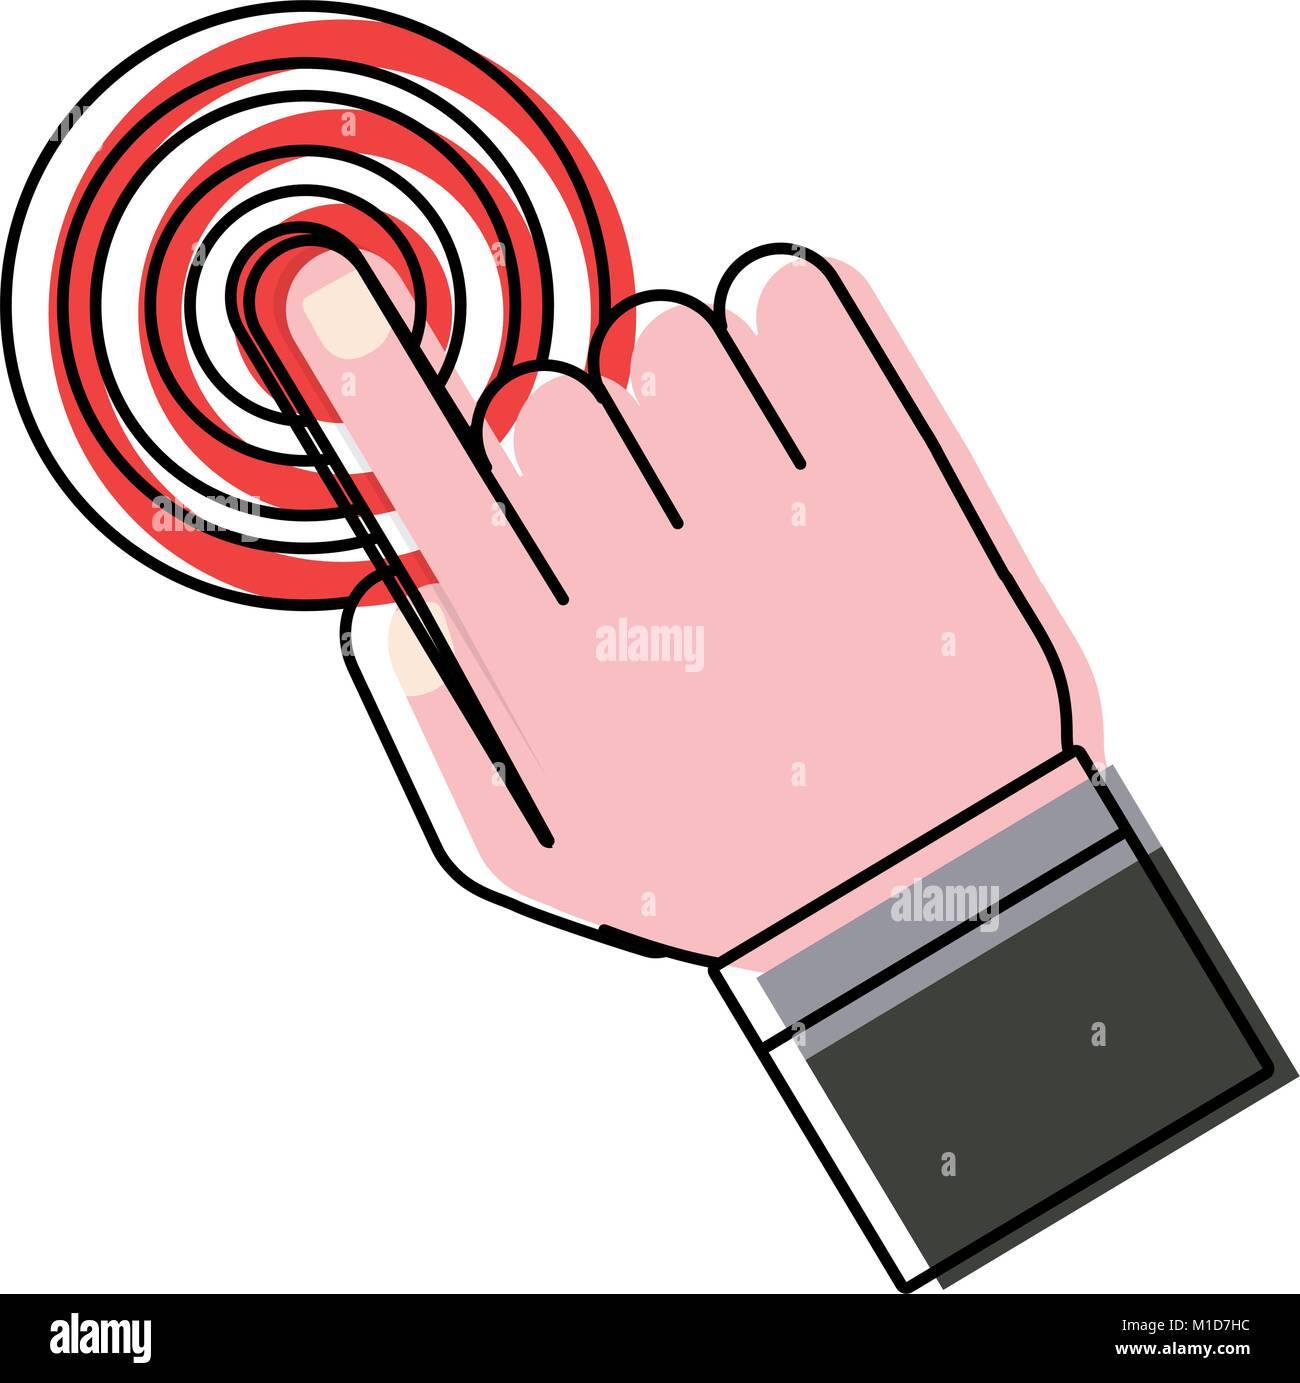 Hand vector illustration - Stock Image